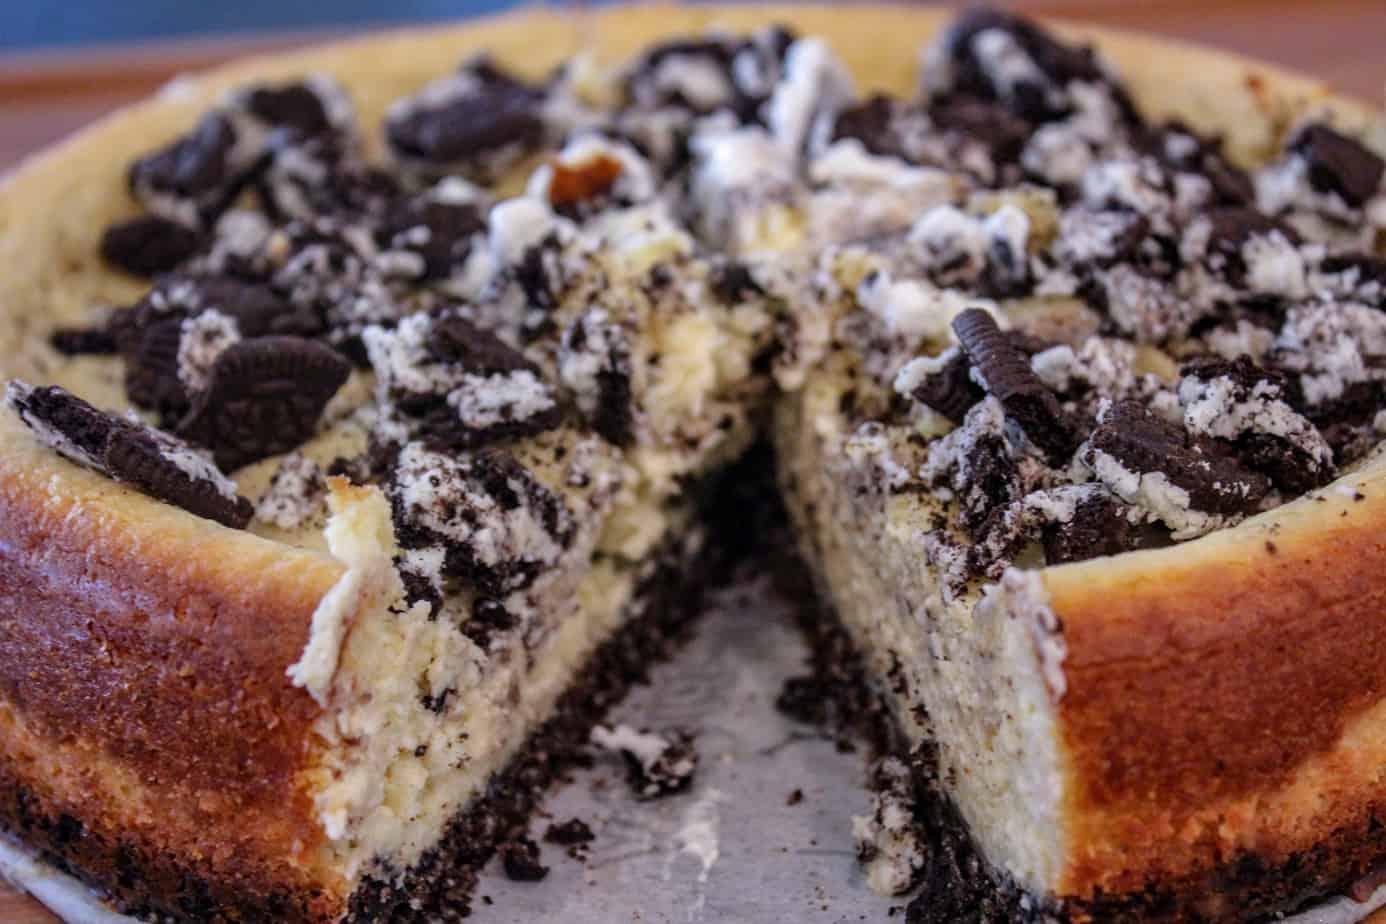 Smoked Oreo Cheesecake